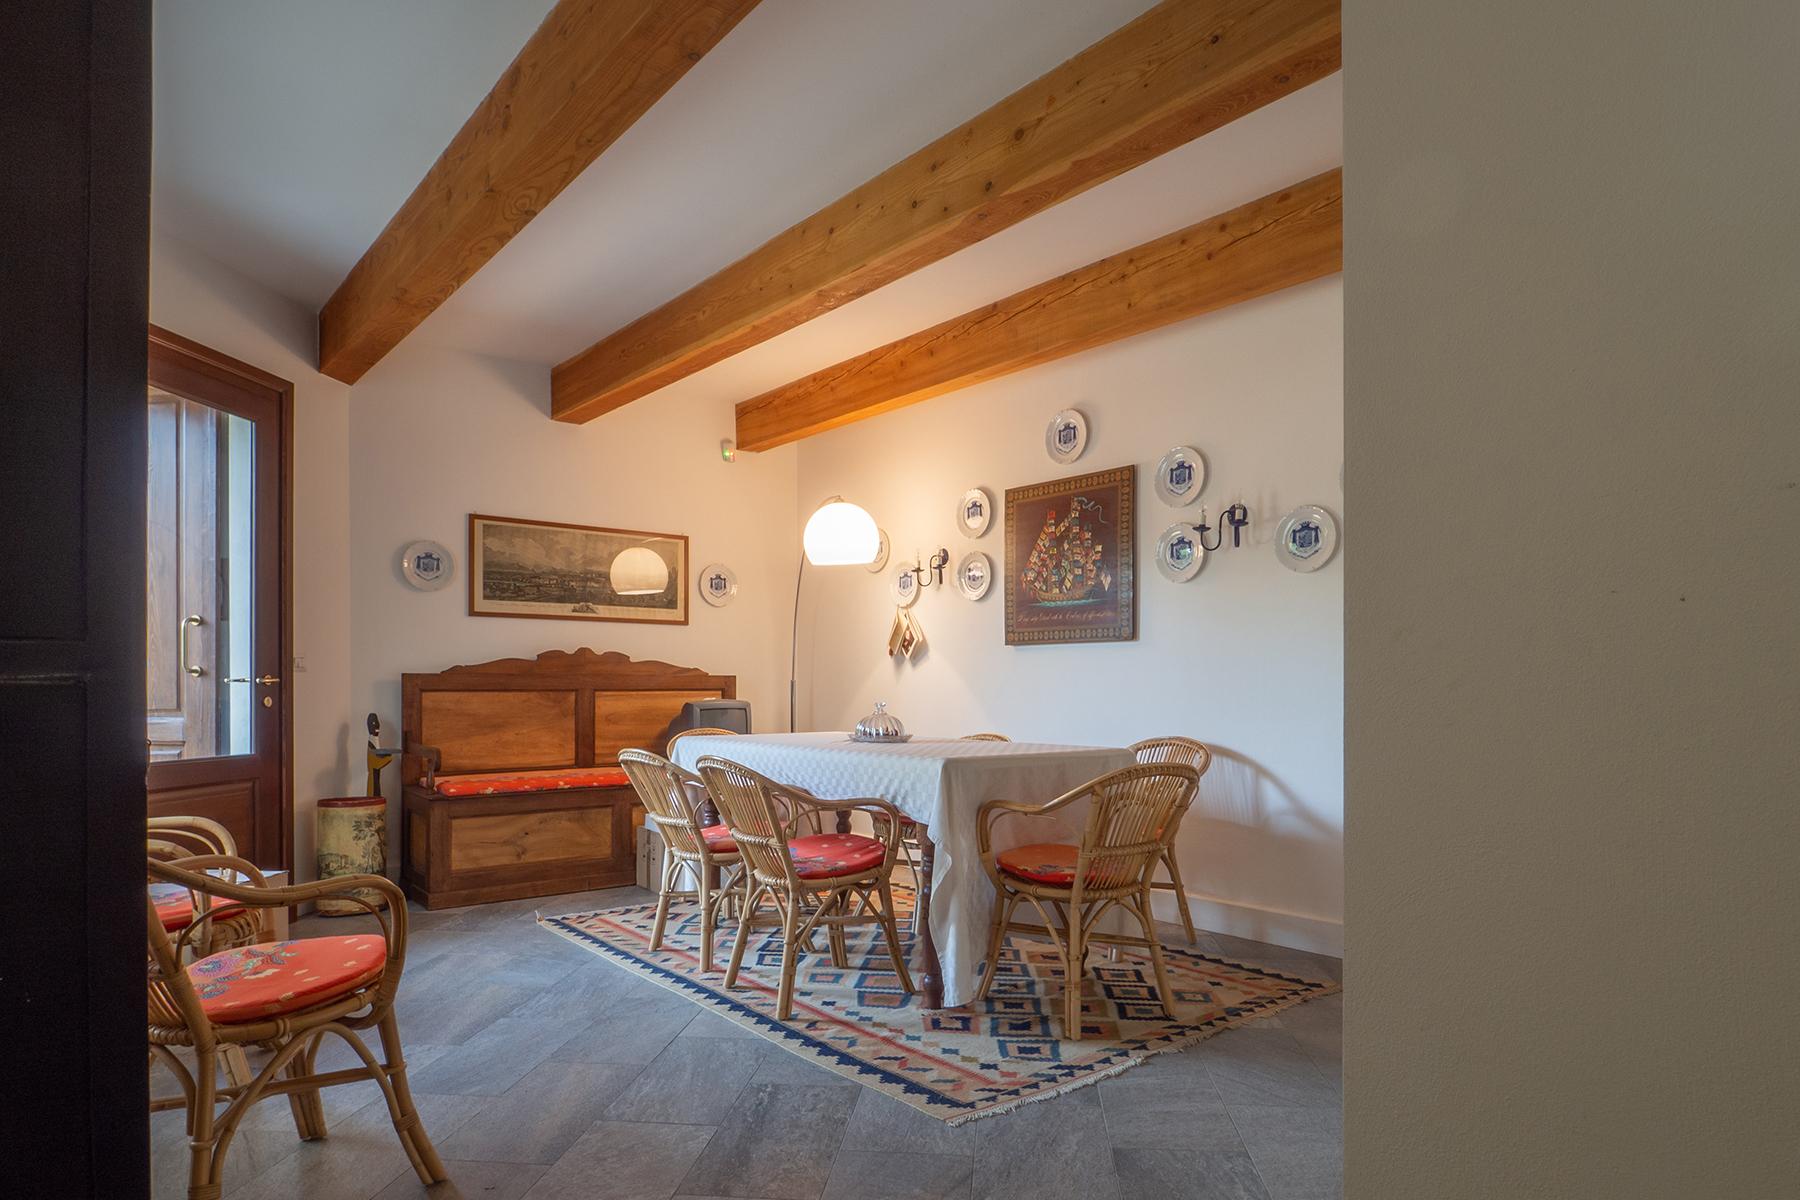 Casa indipendente in Vendita a Torino: 5 locali, 657 mq - Foto 25